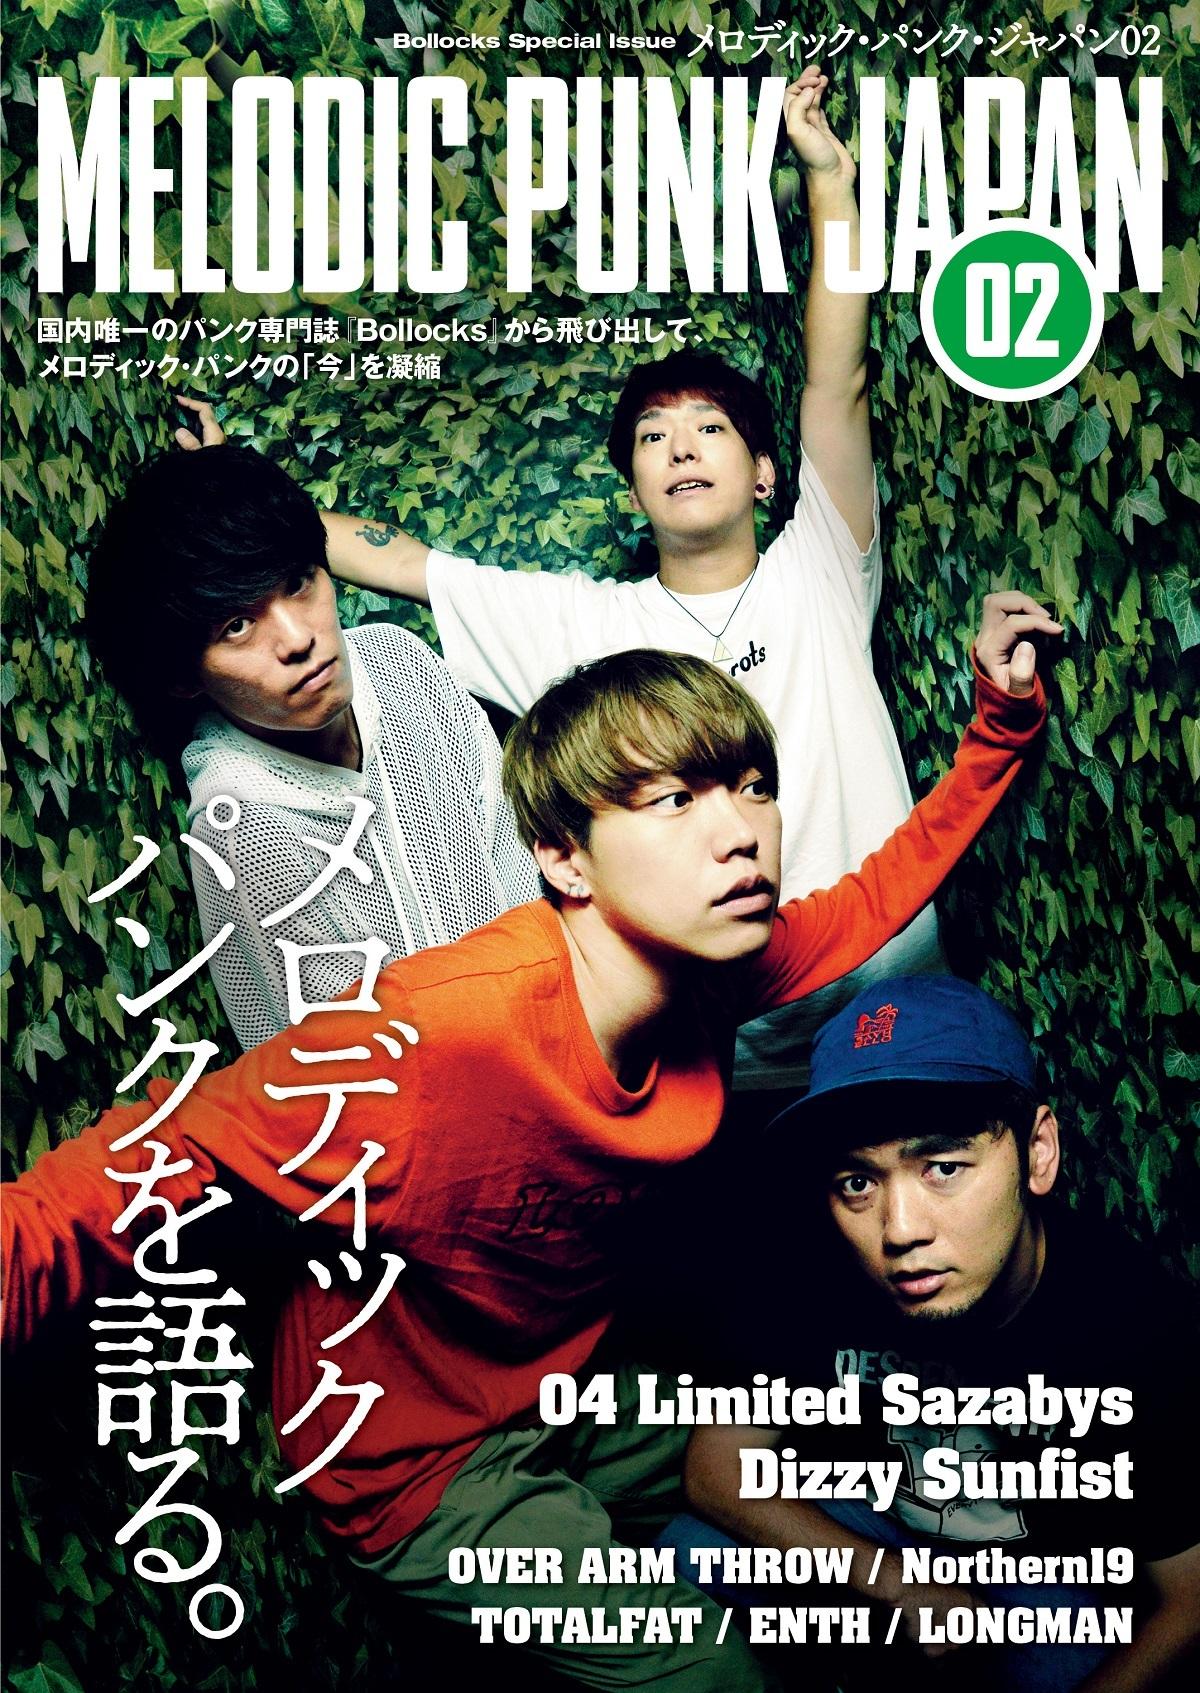 『Melodic Punk JAPAN 02』